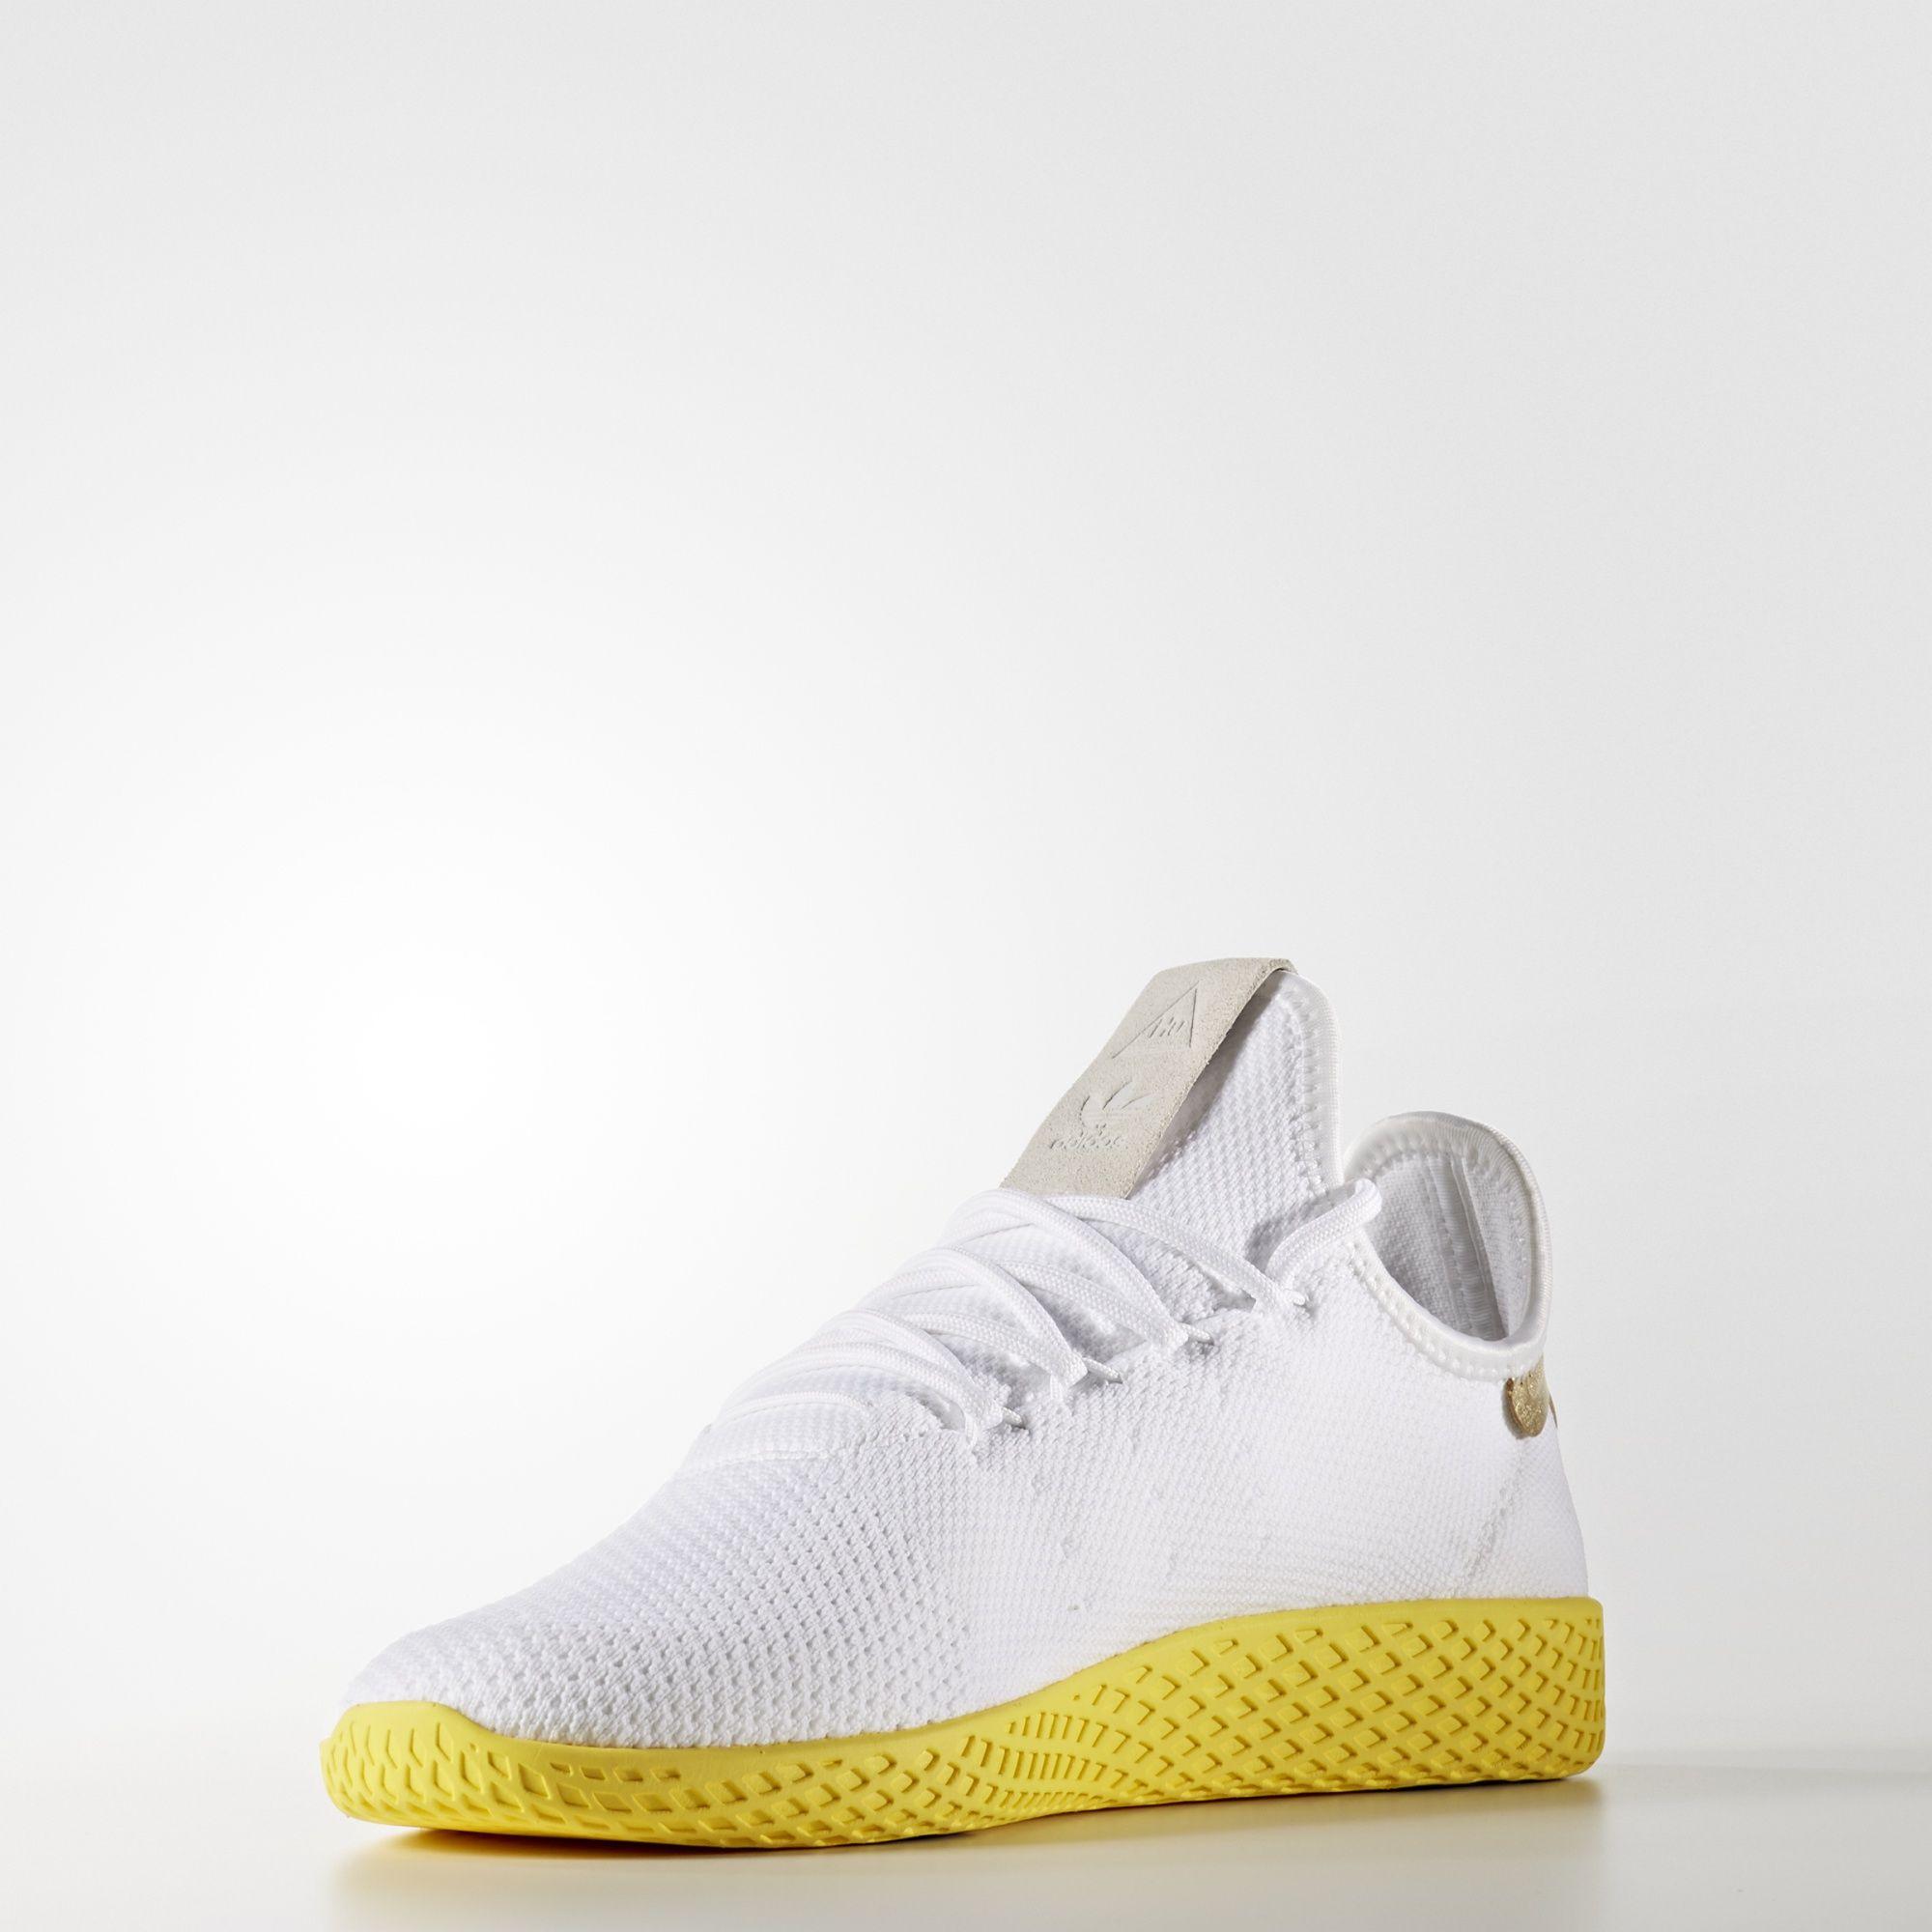 Pharrell Williams x adidas Tennis HU Primeknit Yellow BY2674 2